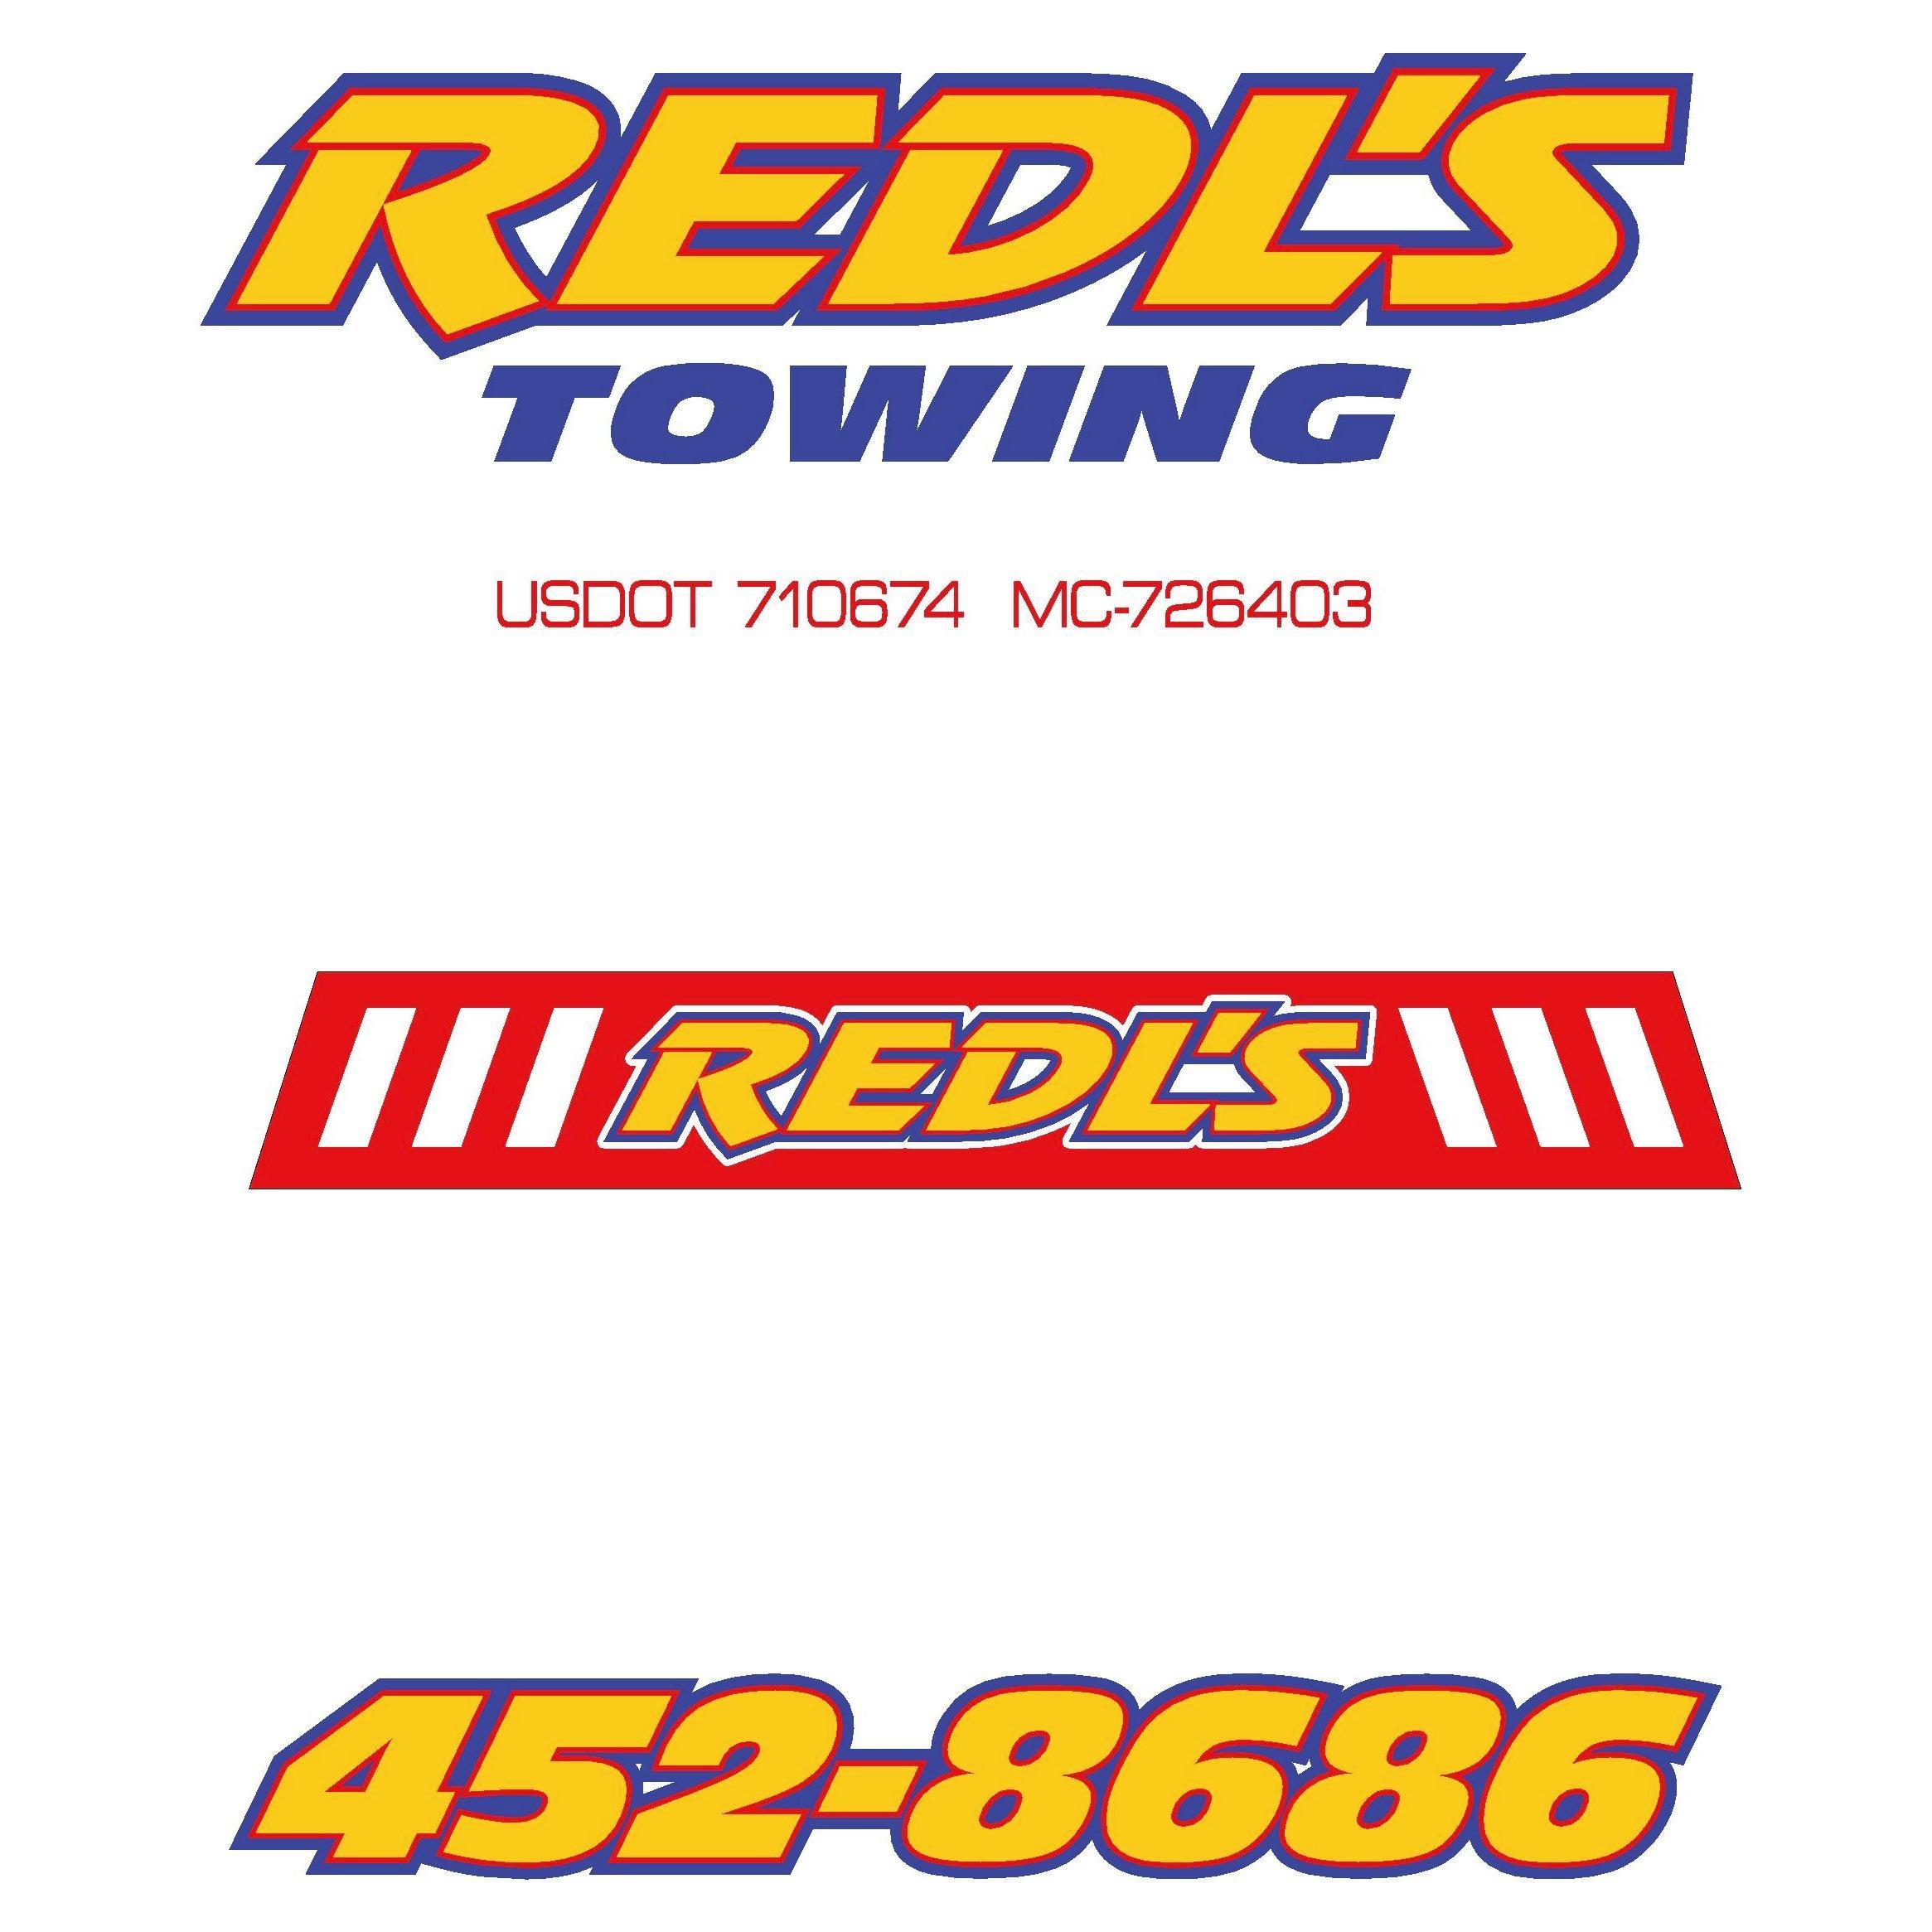 Redl's Towing image 12